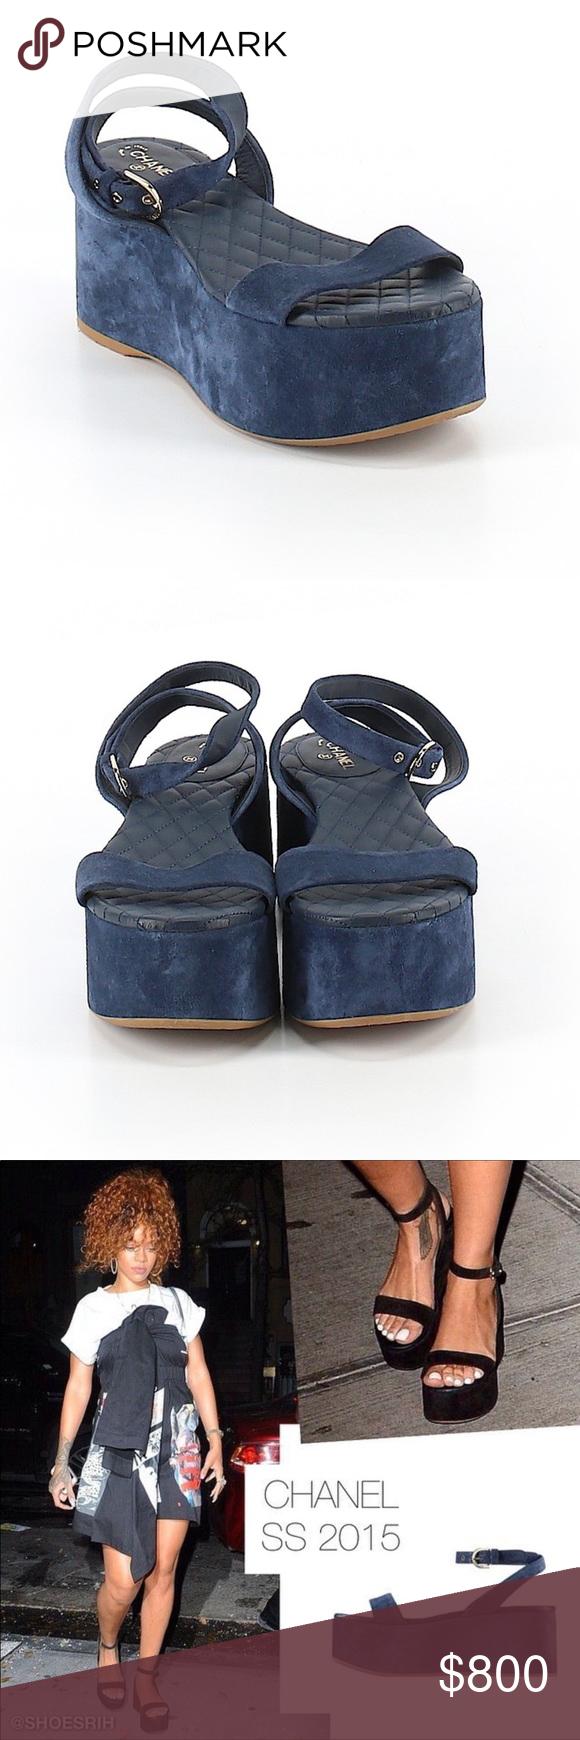 blue suede platform sandals